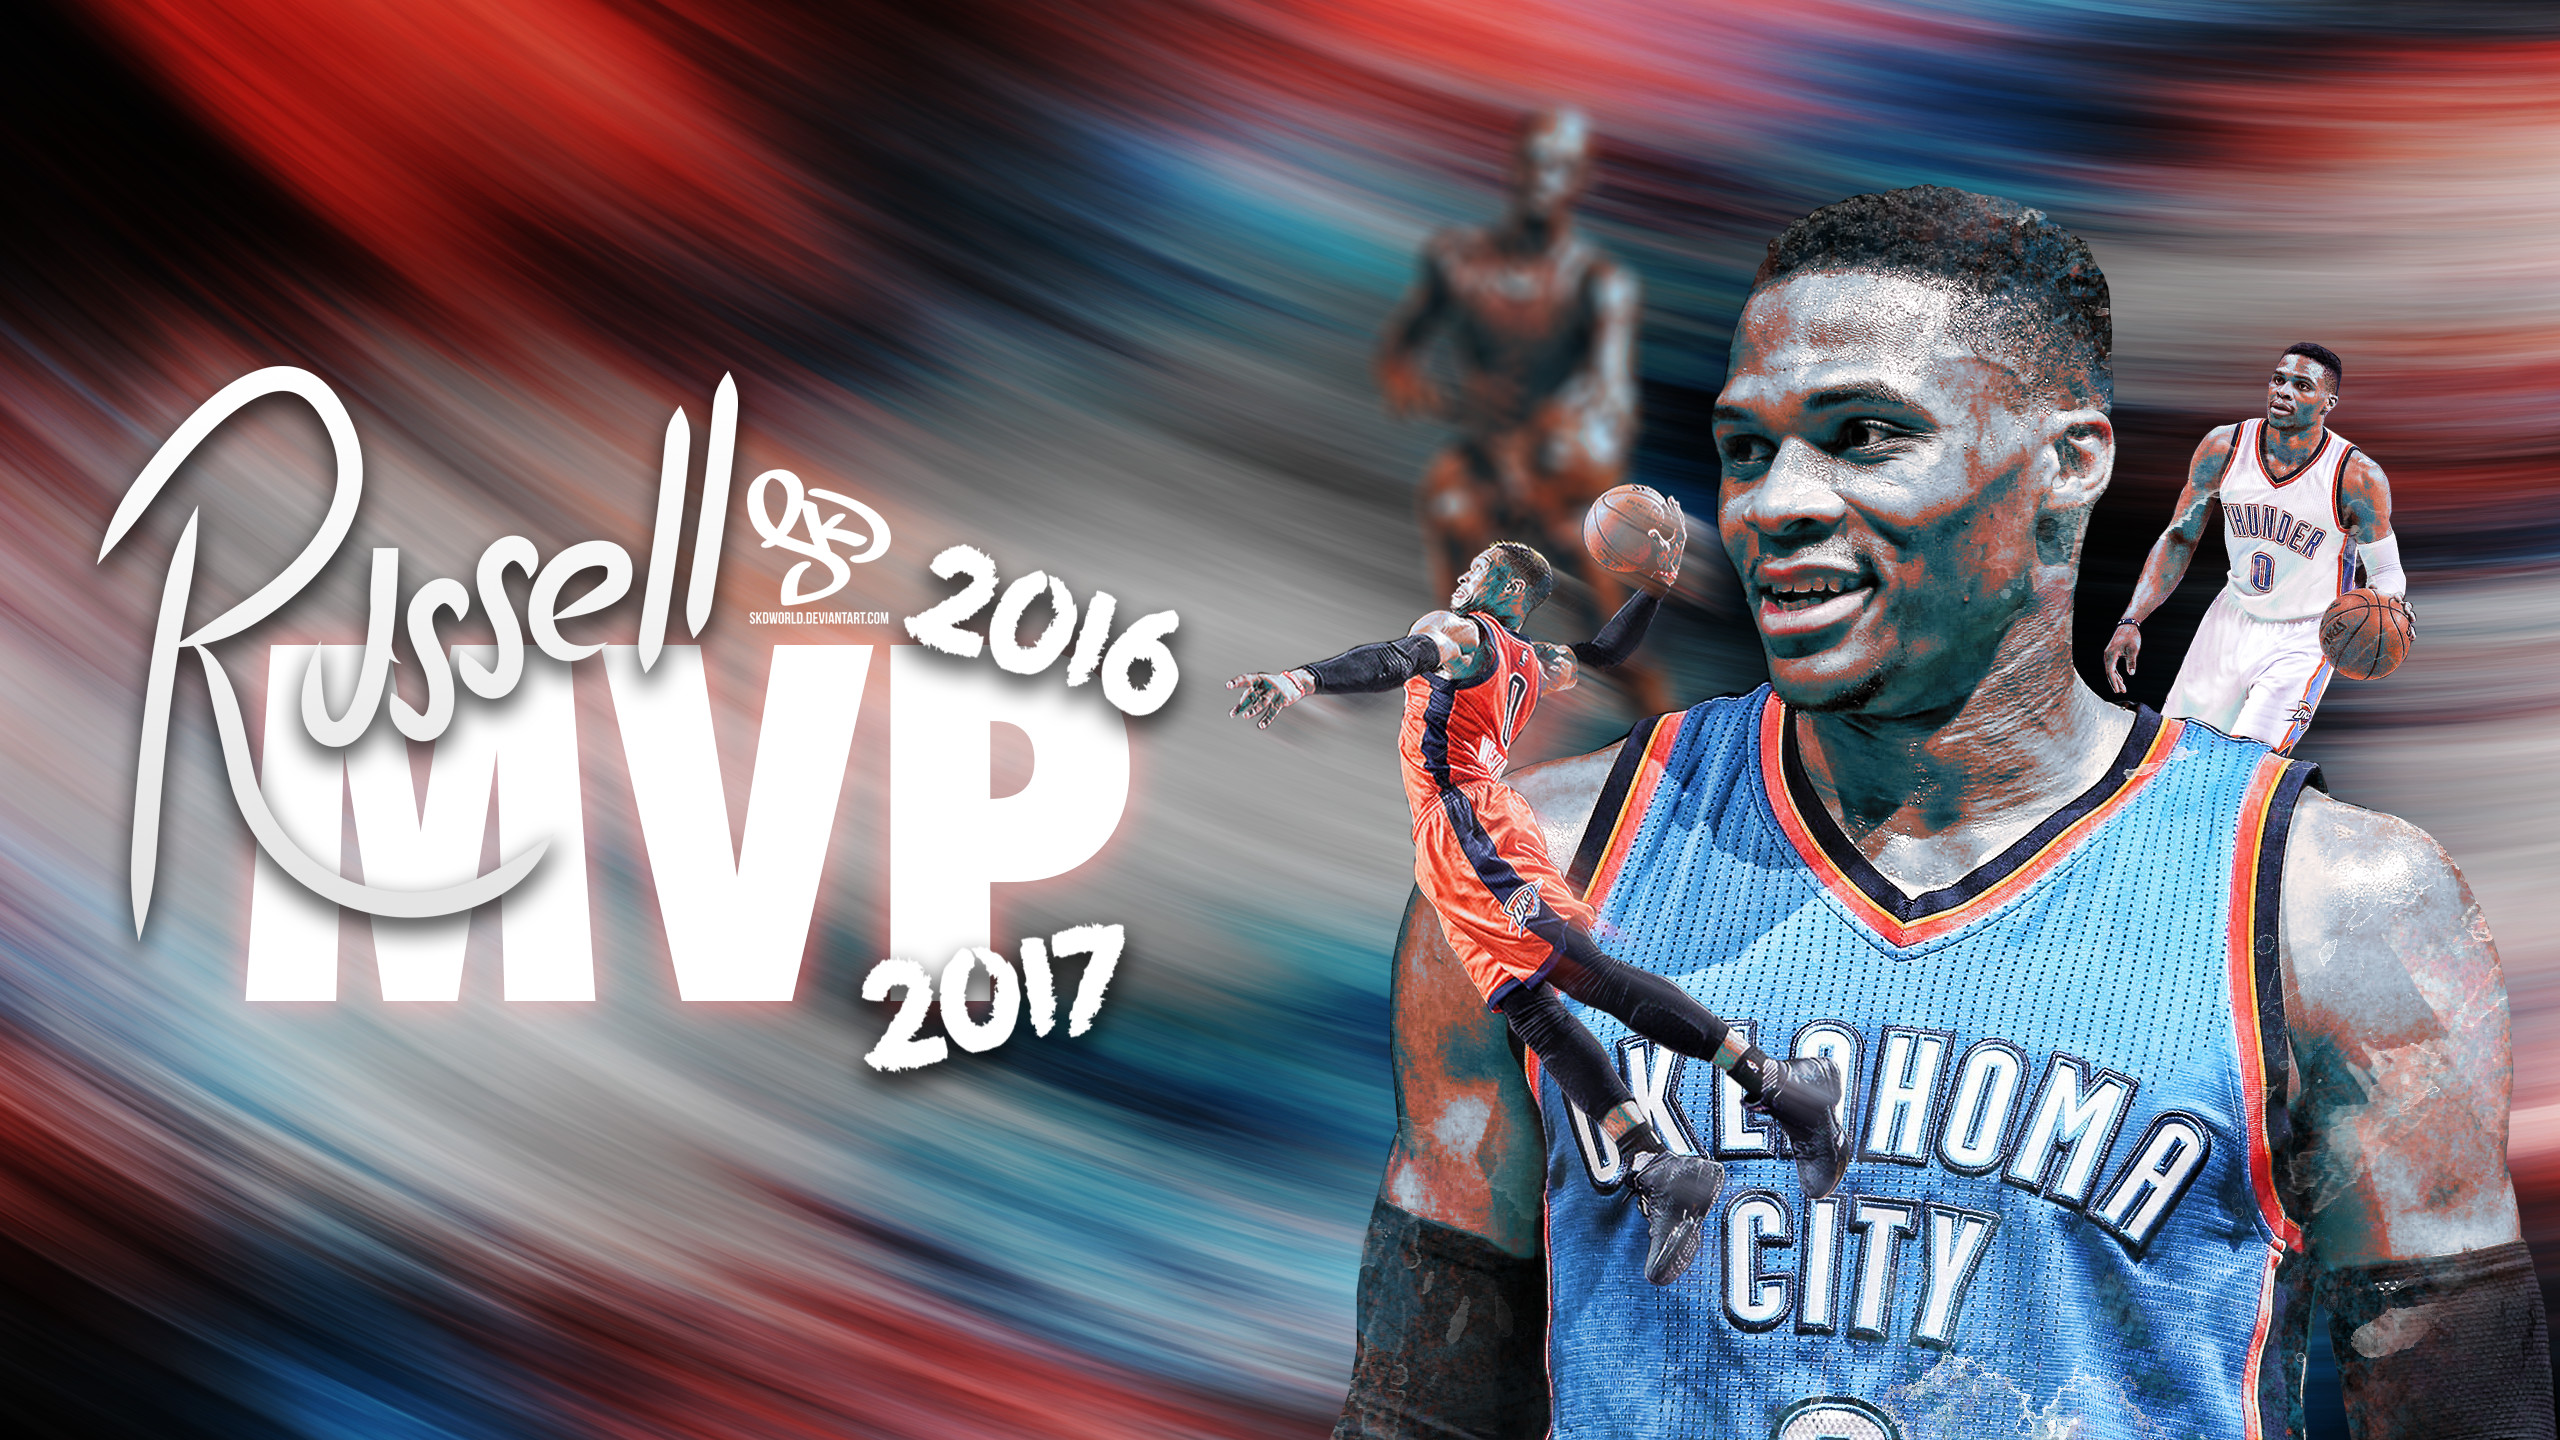 … Russell Westbrook: 2016-2017 NBA MVP by SkdWorld